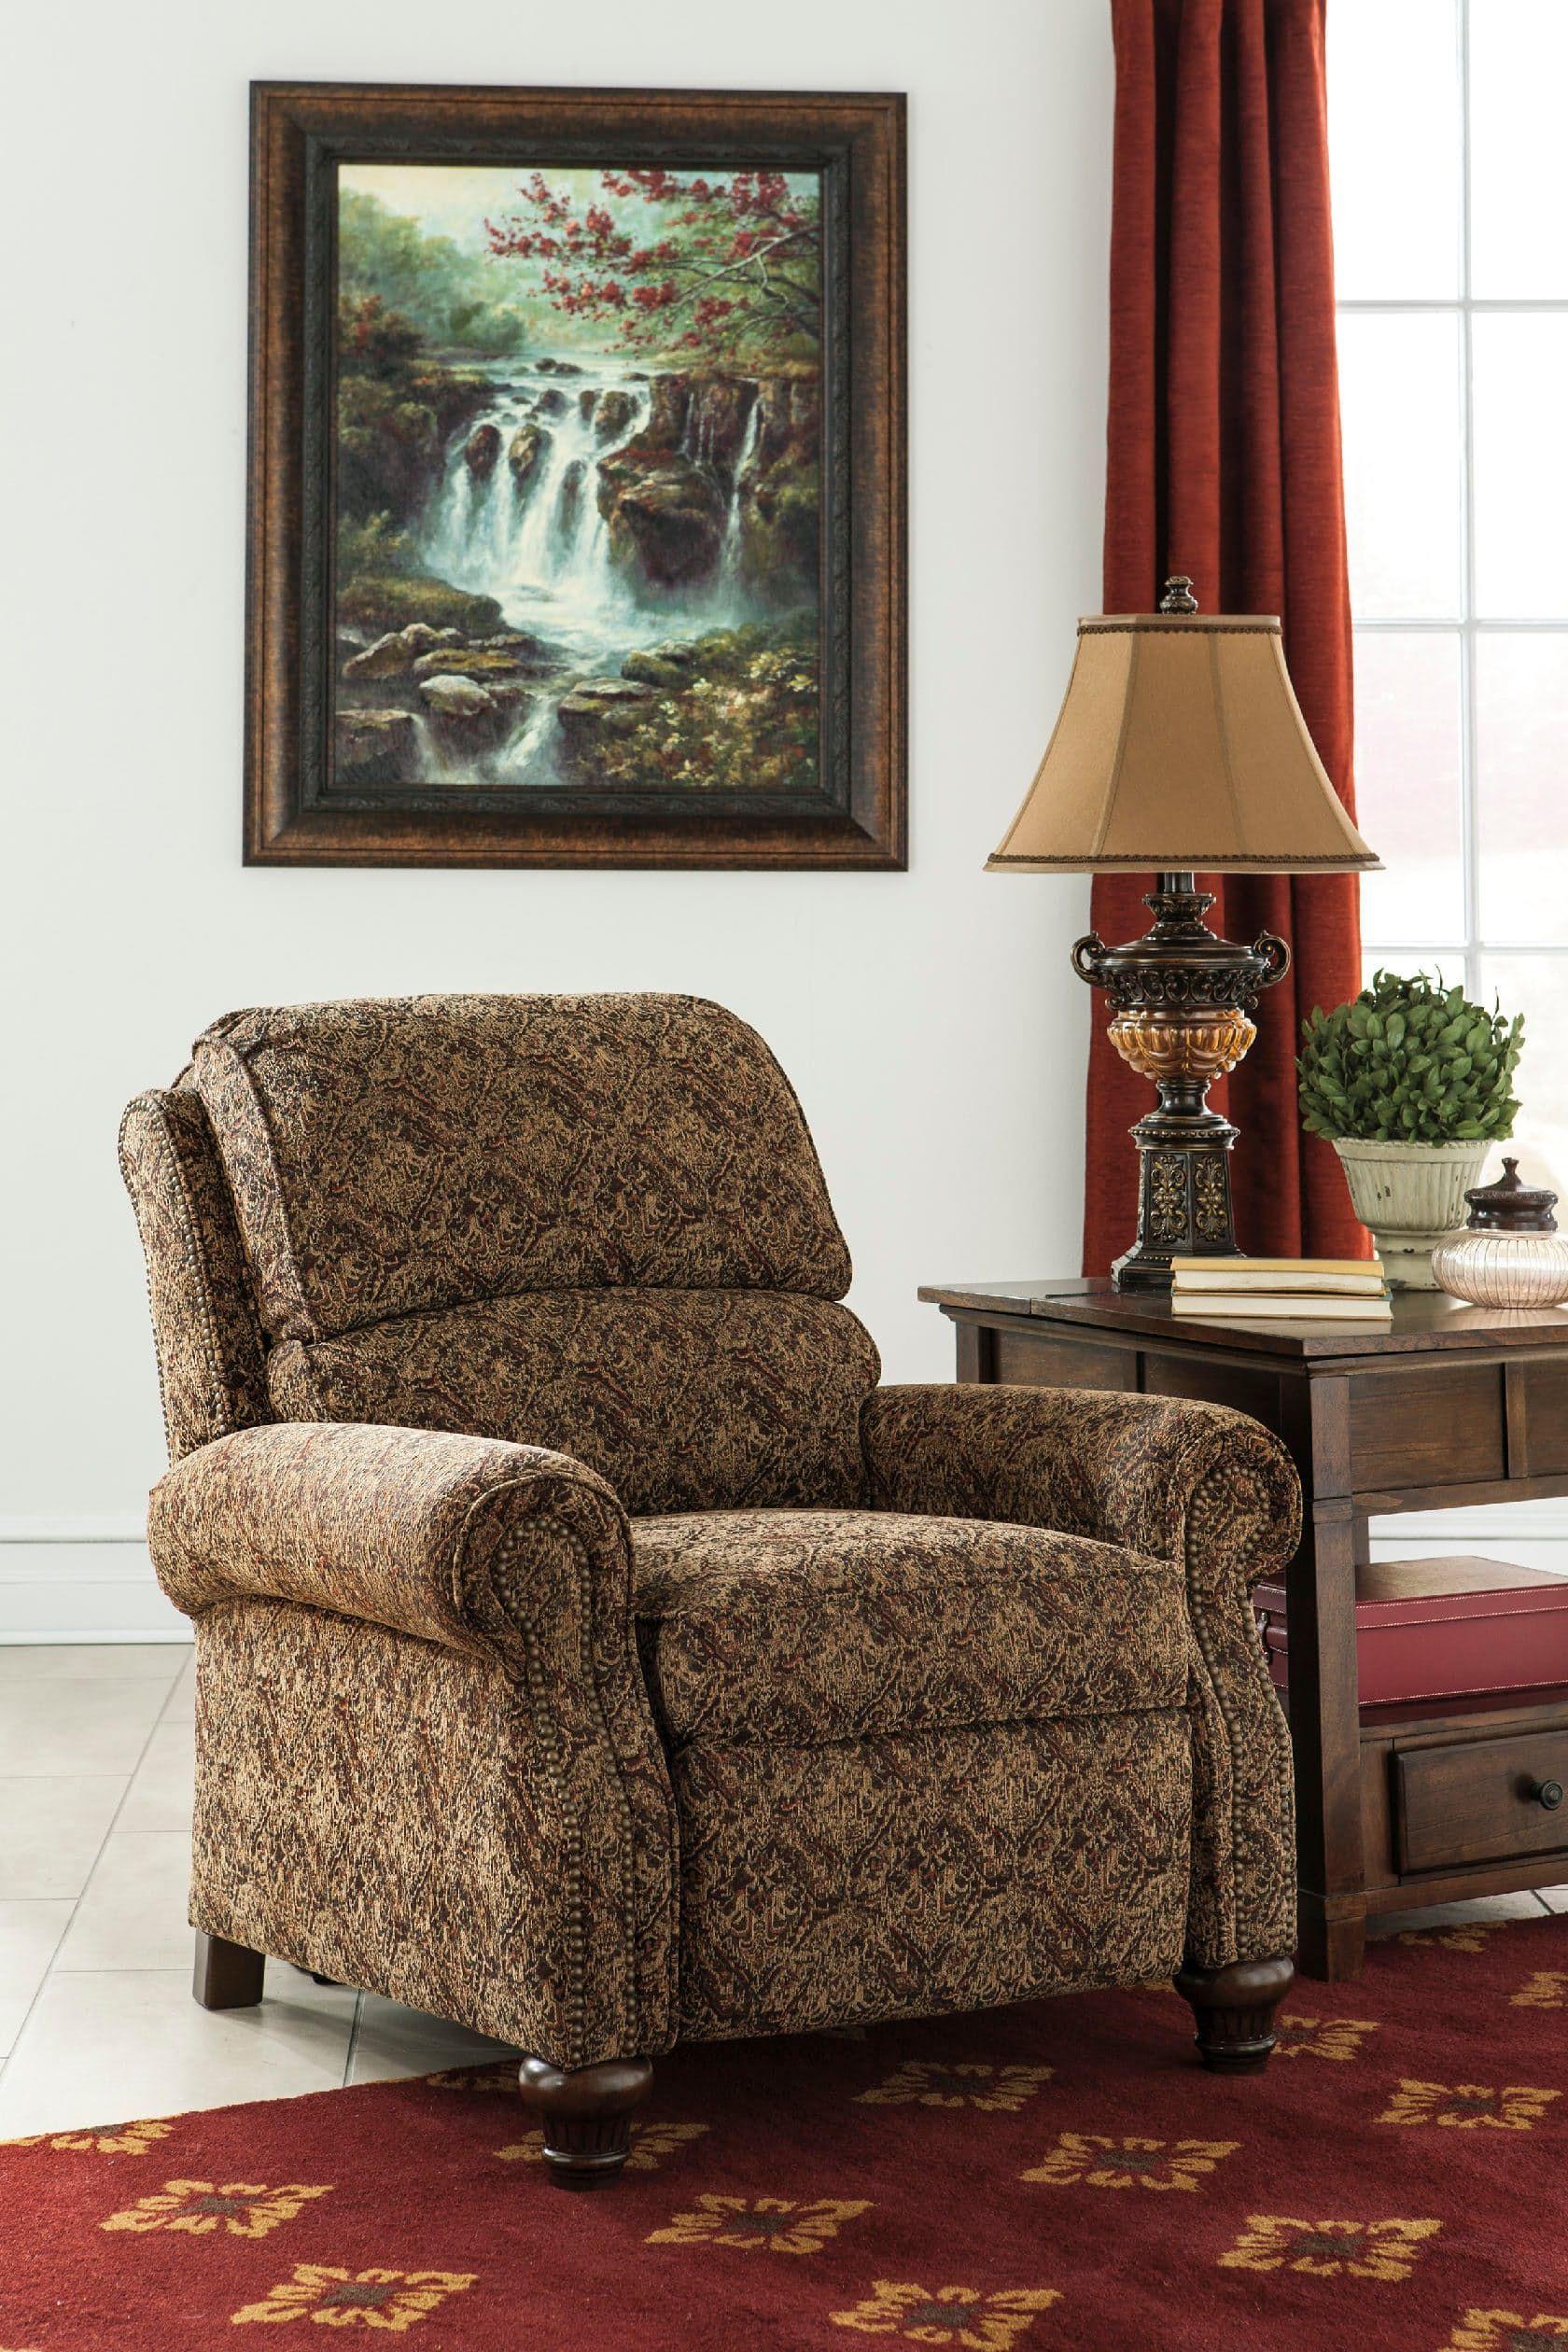 Ashly Babette's Lifestyles Ashley furniture, Home